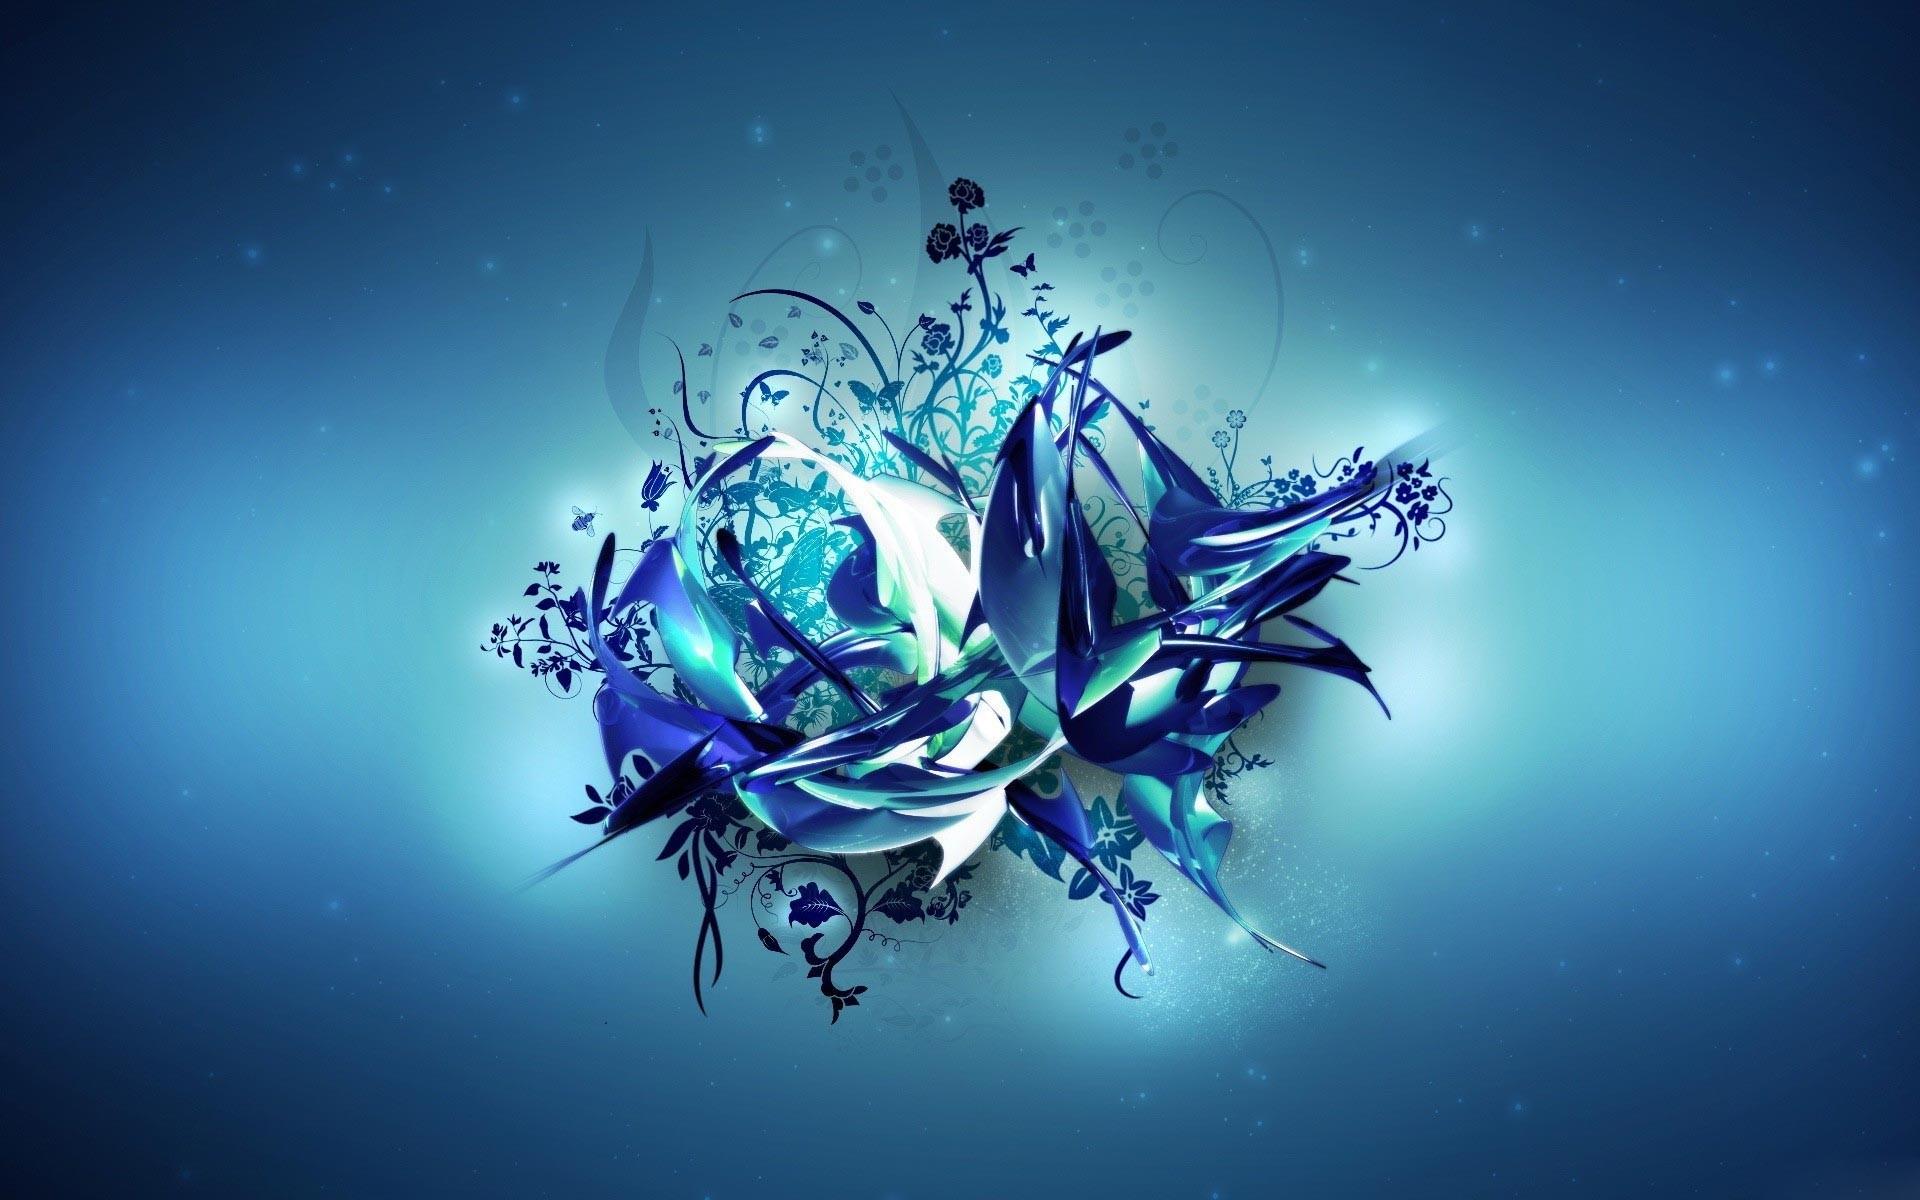 Blue Dragon HD Wallpapers 12 #BlueDragonHDWallpapers #BlueDragon  #hdwallpapers #wallpapers